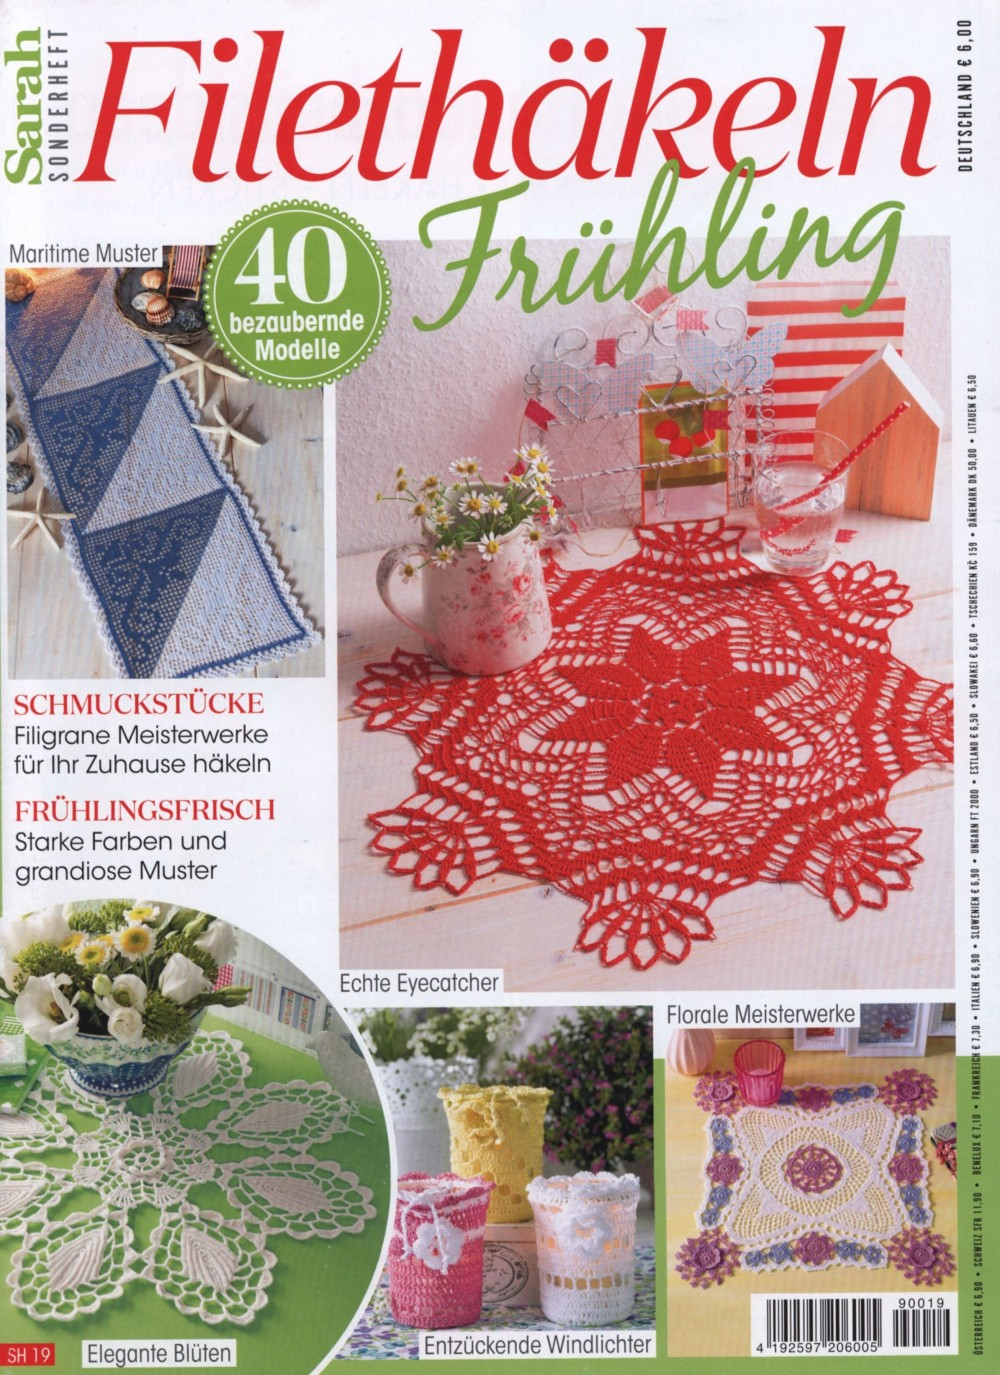 Журнал по вязанию крючком «Sarah — Filethakeln» SH19 2019